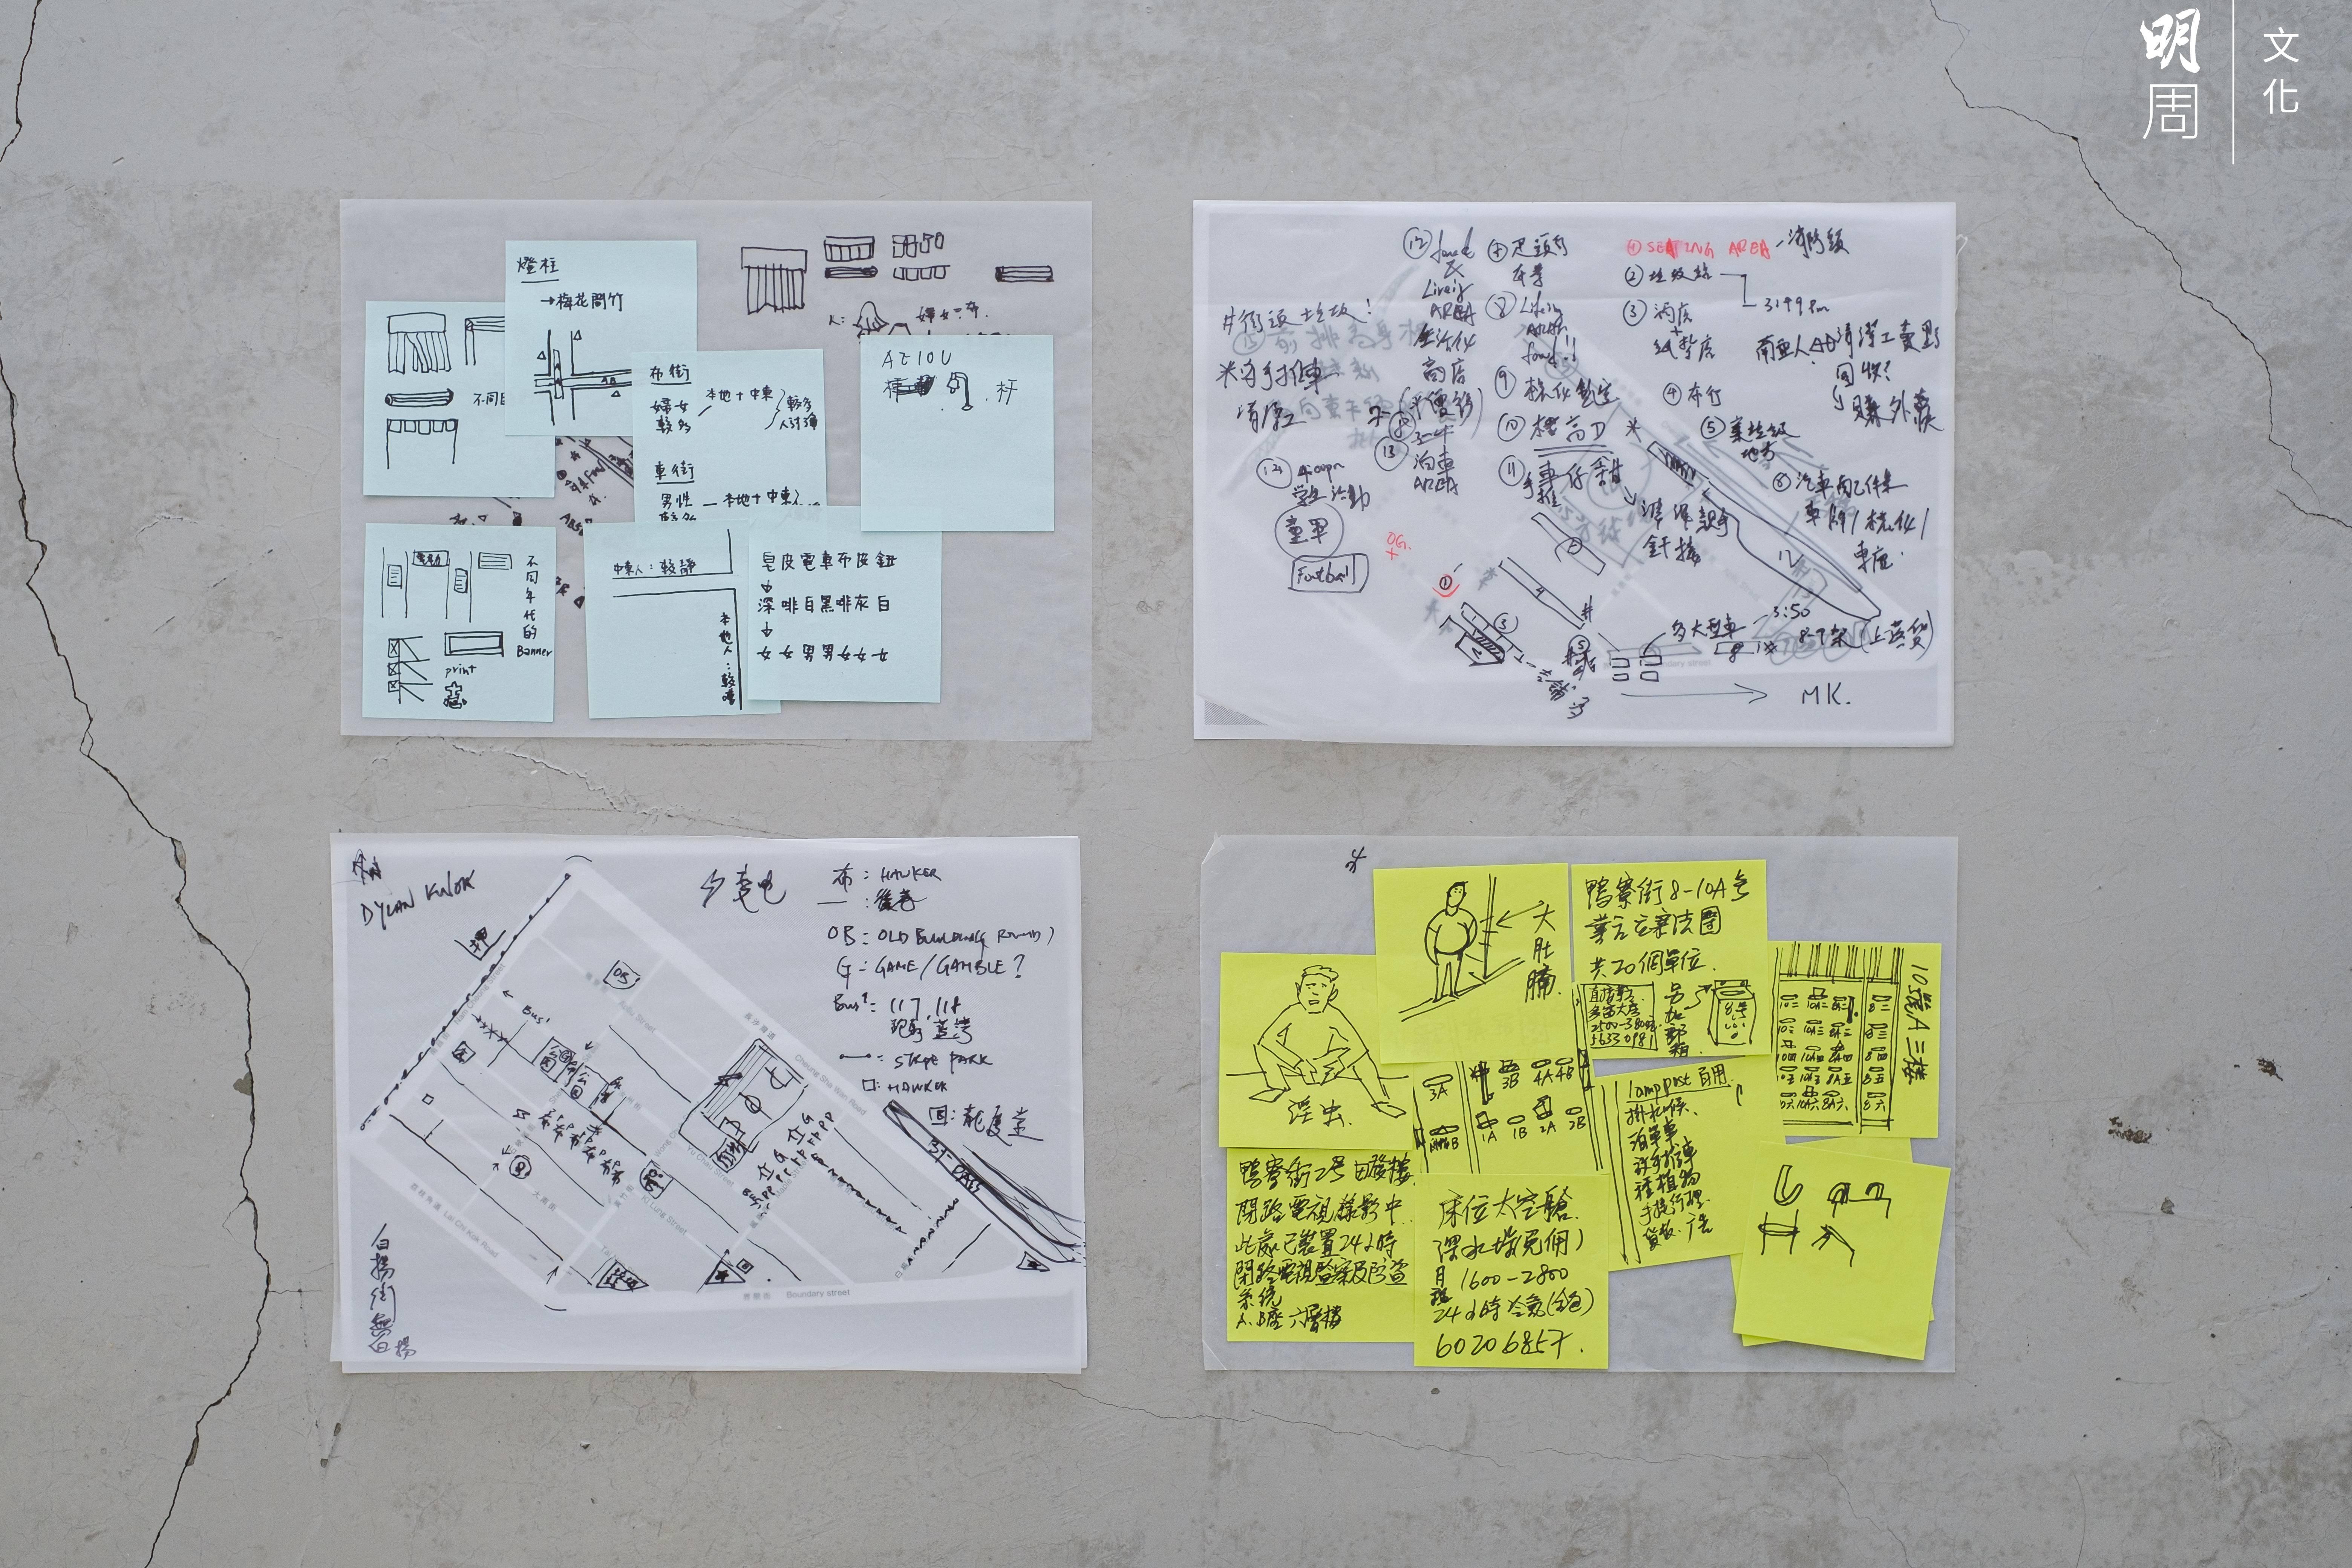 #City設計活動參加者游走深水埗街區後做的筆記